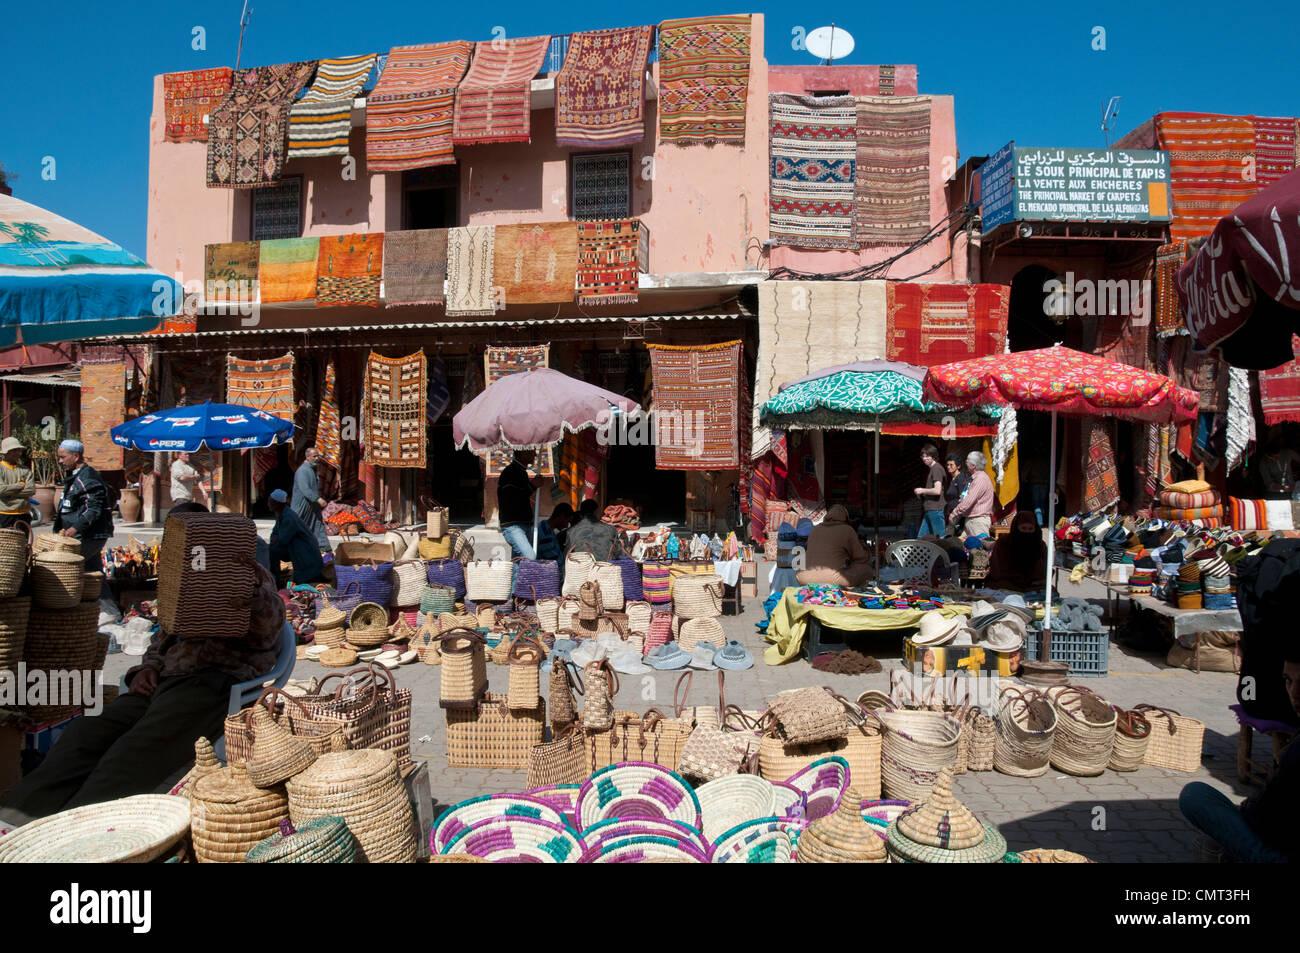 Marrakech - Market souk at Rahba Qedima in Medina district, Marrakech, Morocco - Stock Image